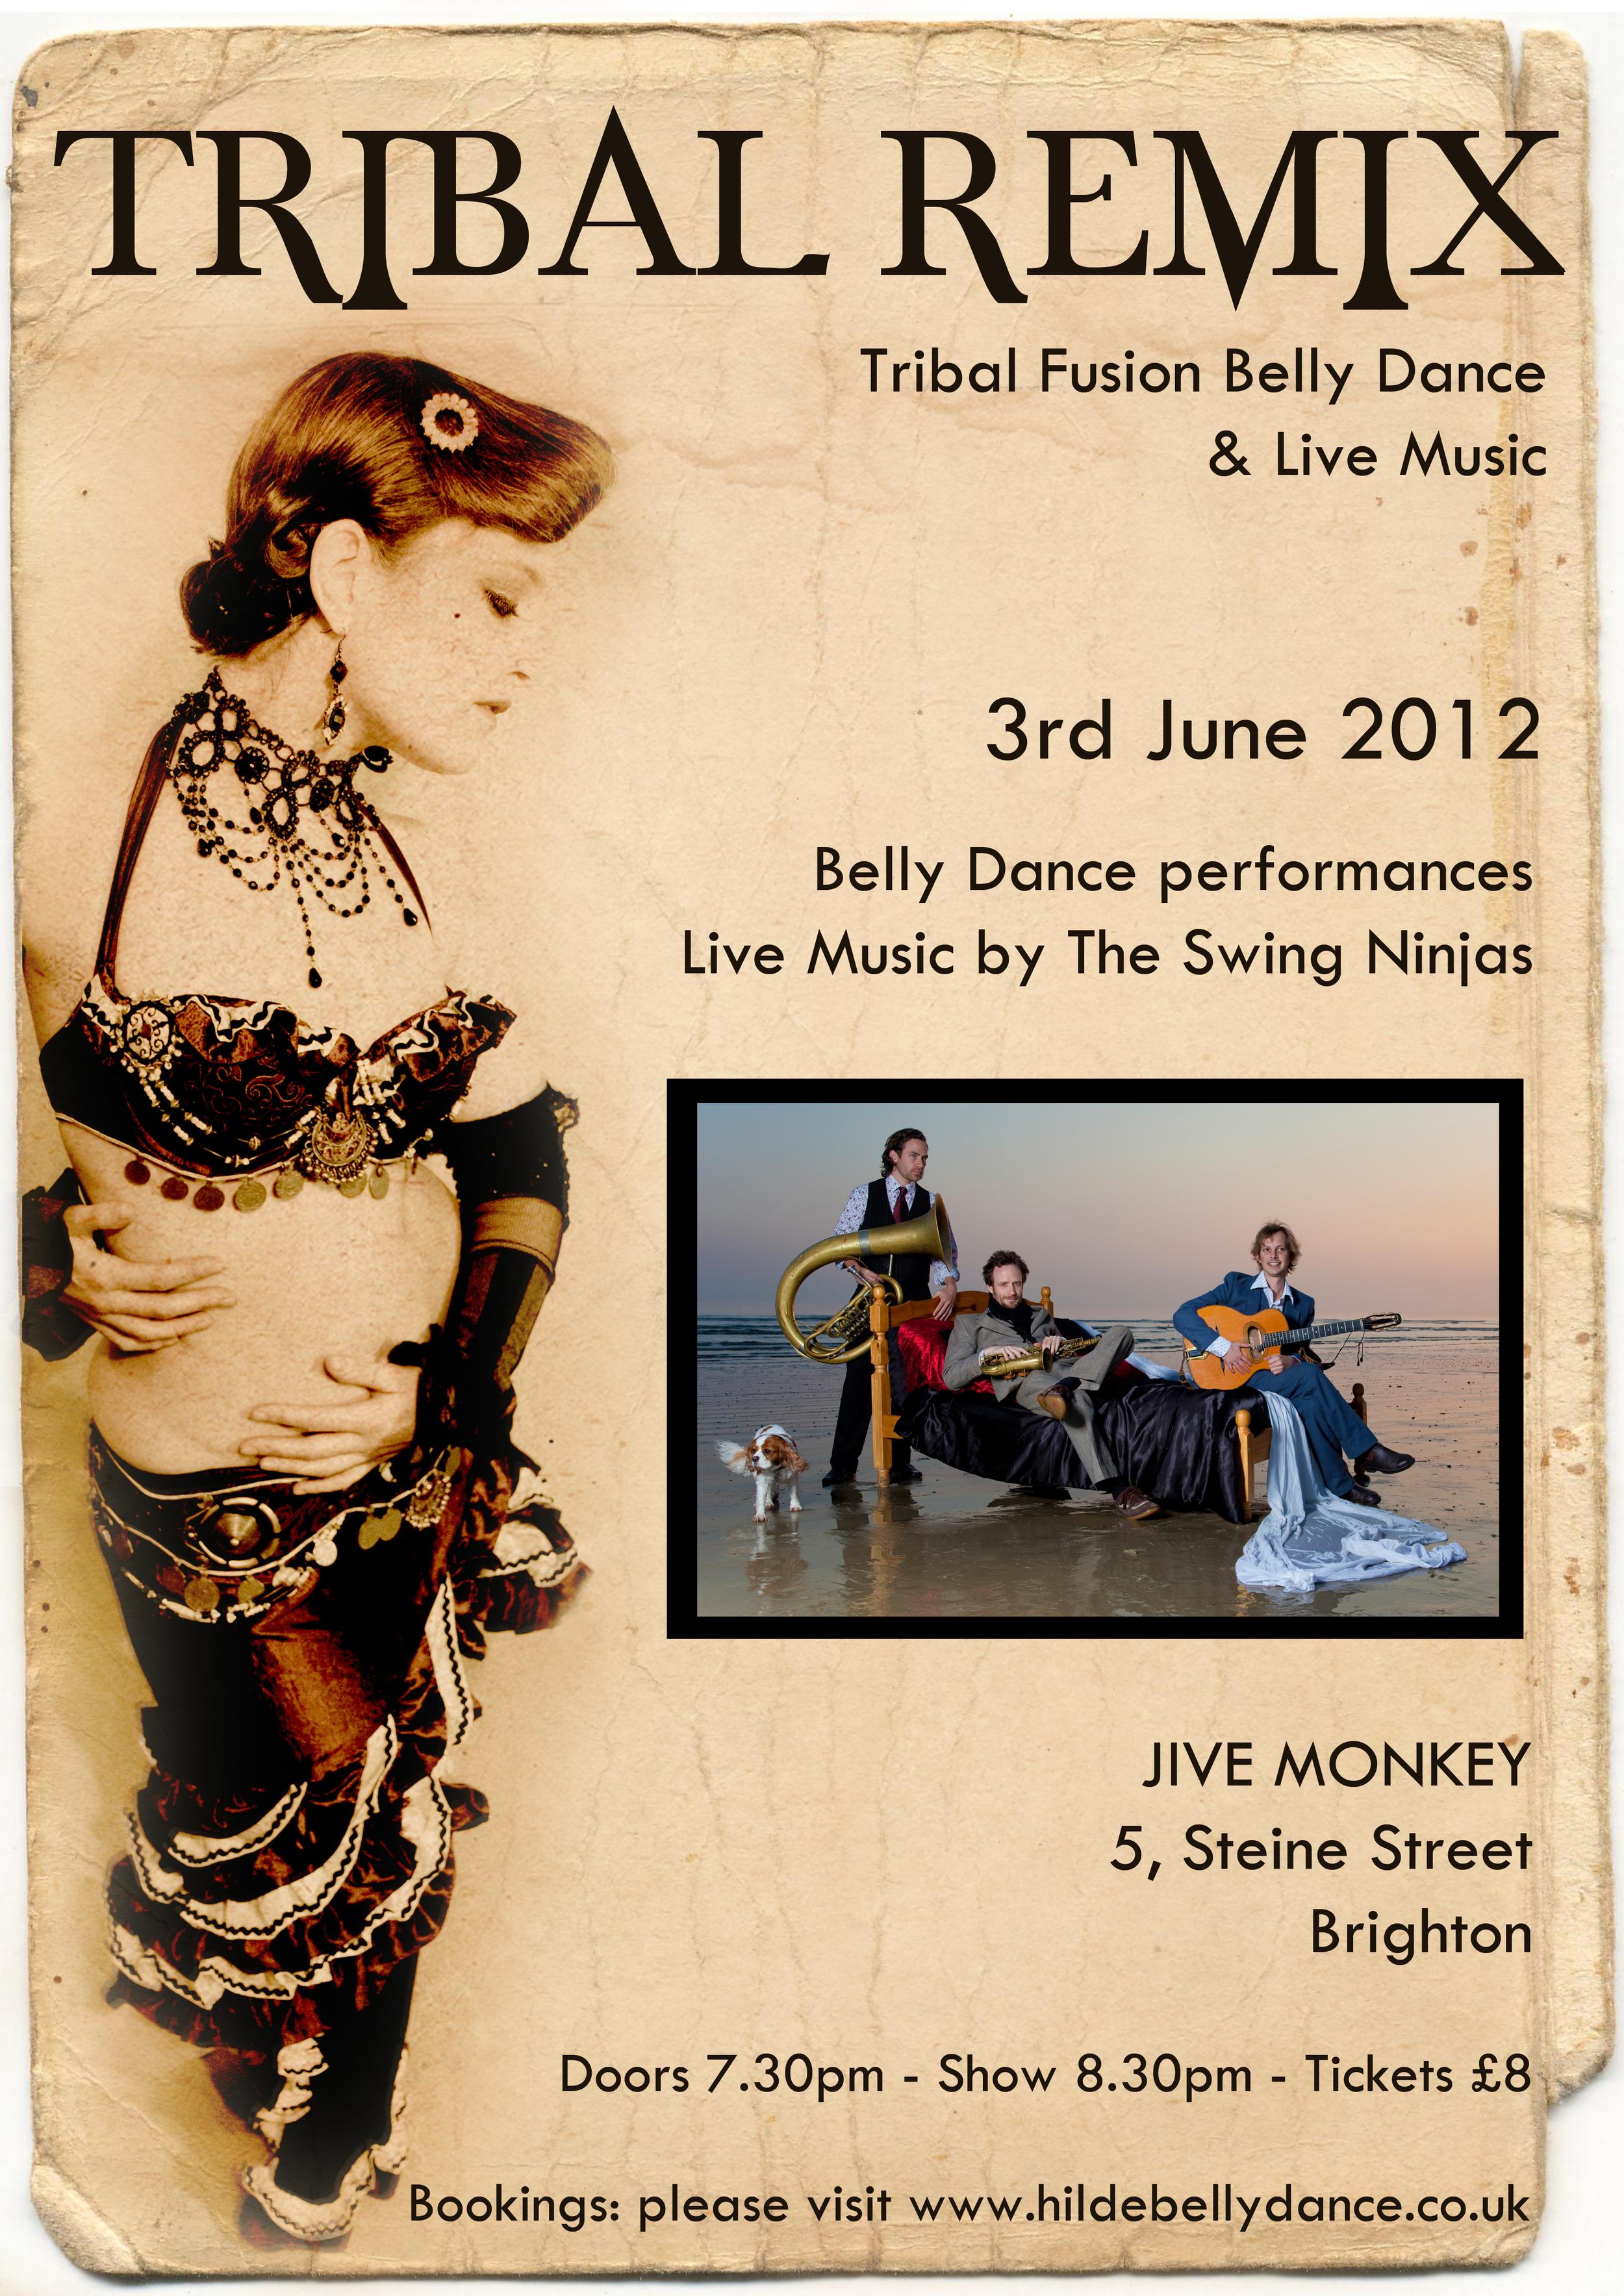 tribal remix hafla poster.jpg